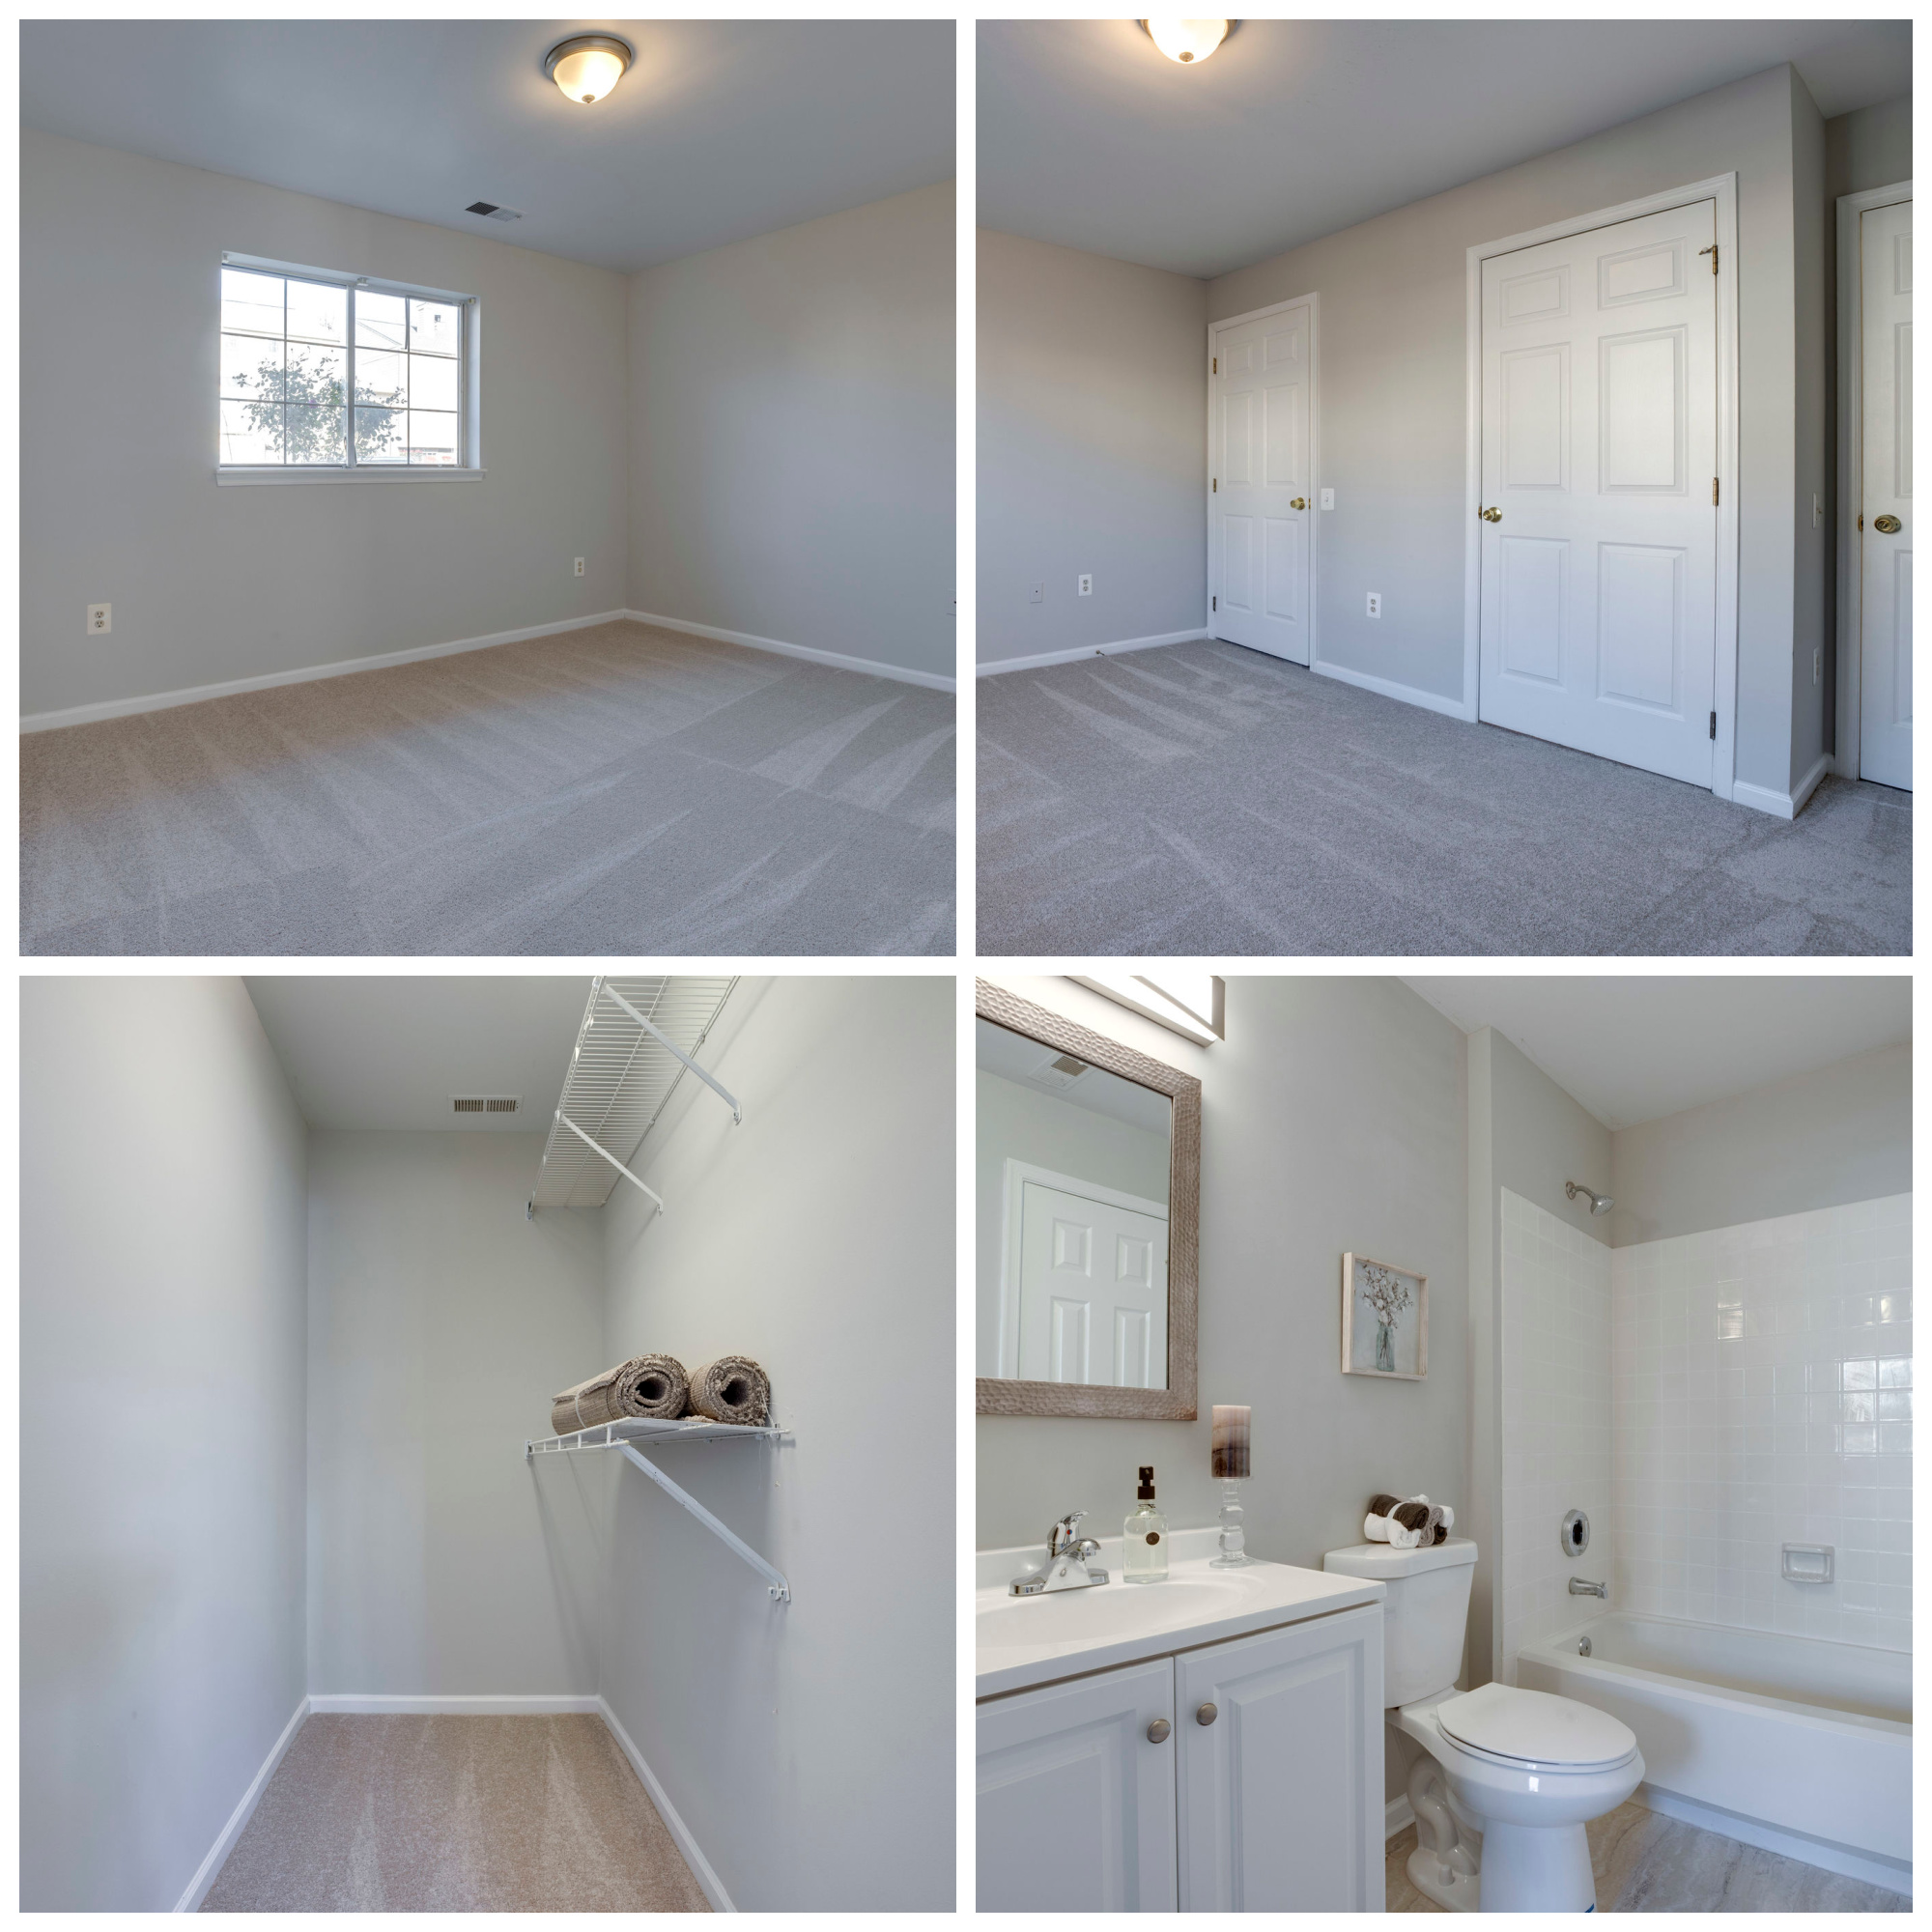 11193 Rienzi Pl #102, Manassas- Additional Bedroom and Bathroom